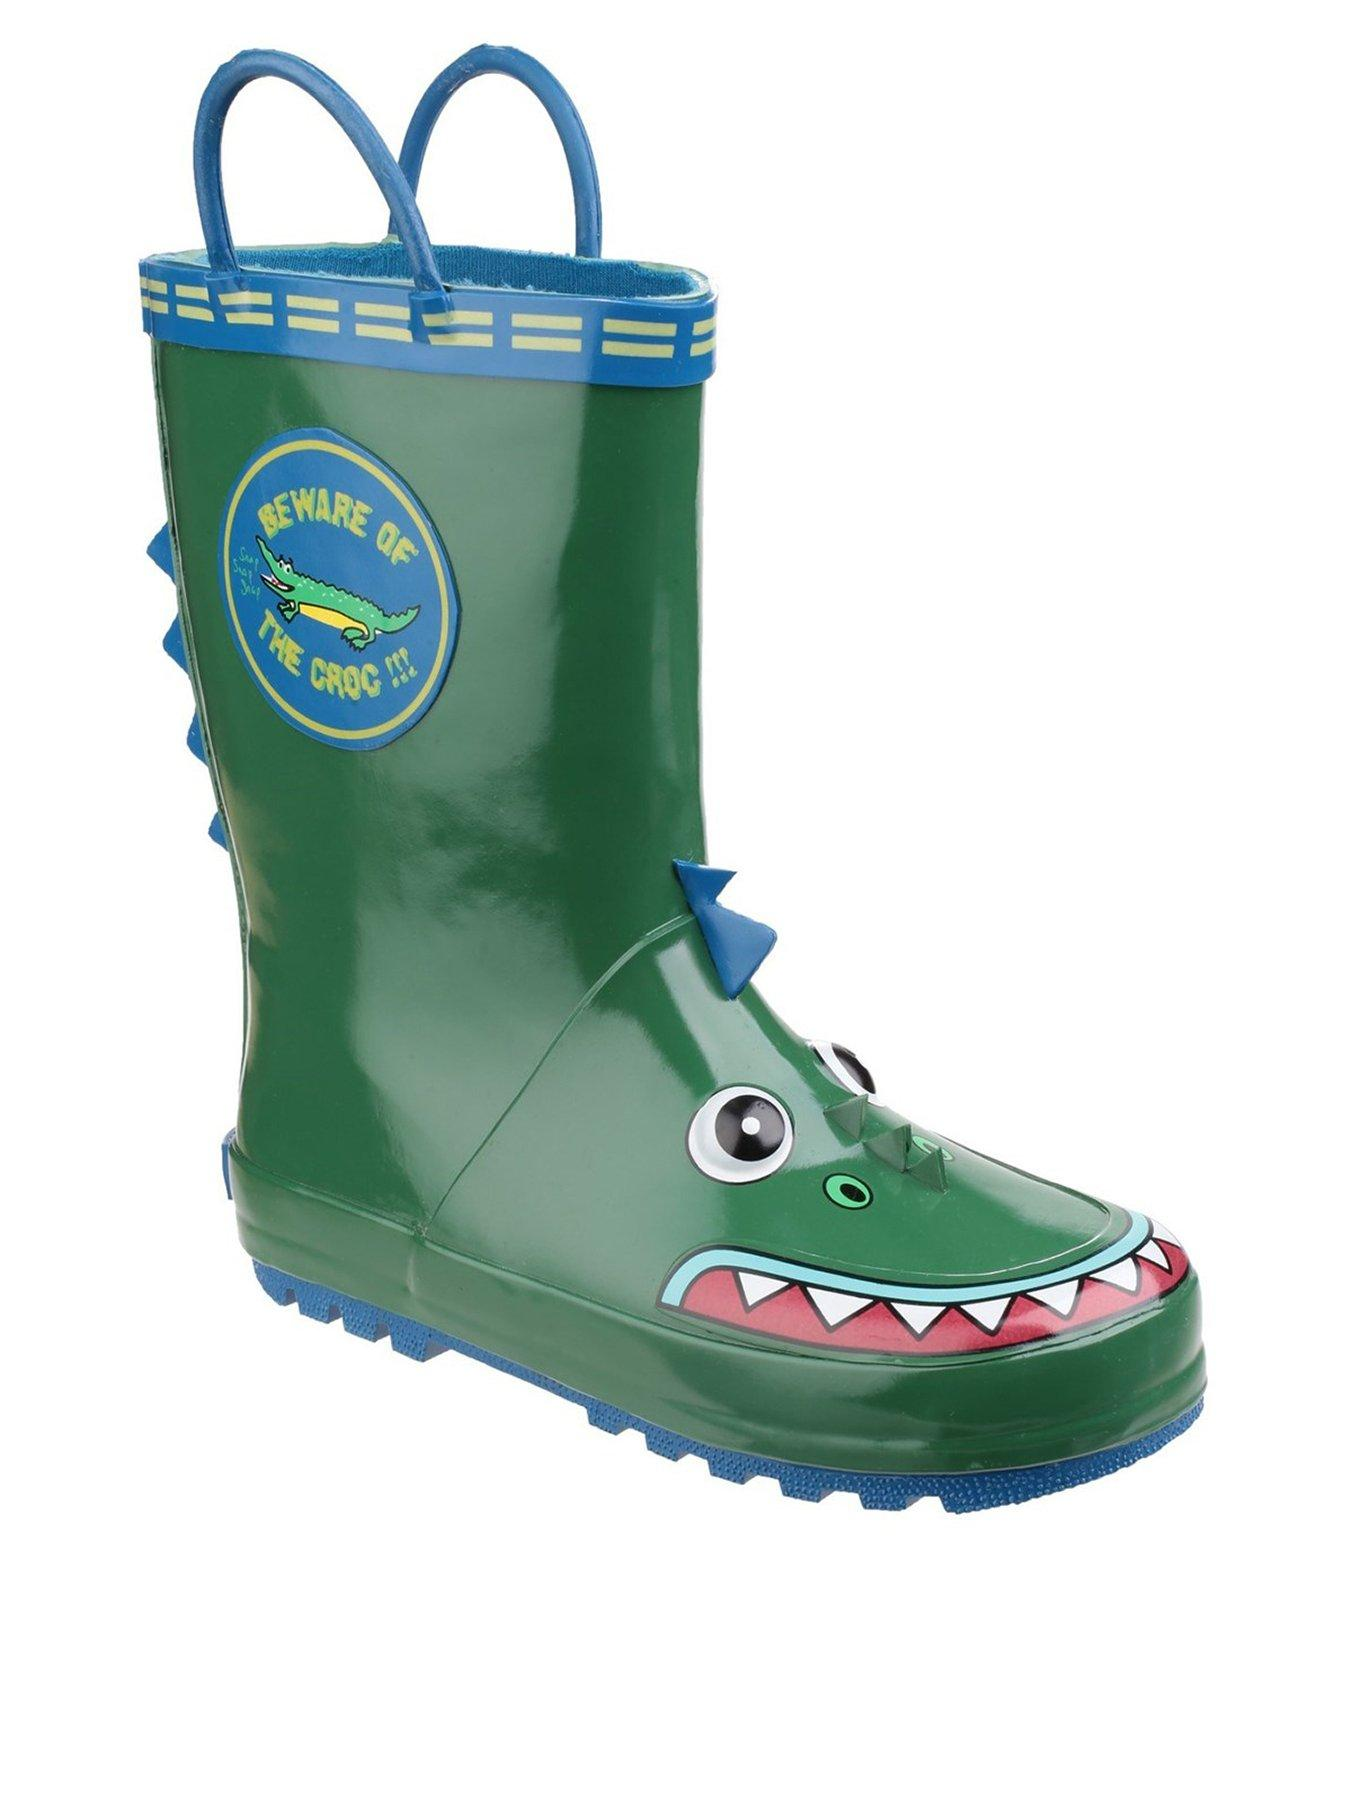 Boy   Shoes \u0026 boots   Child \u0026 baby